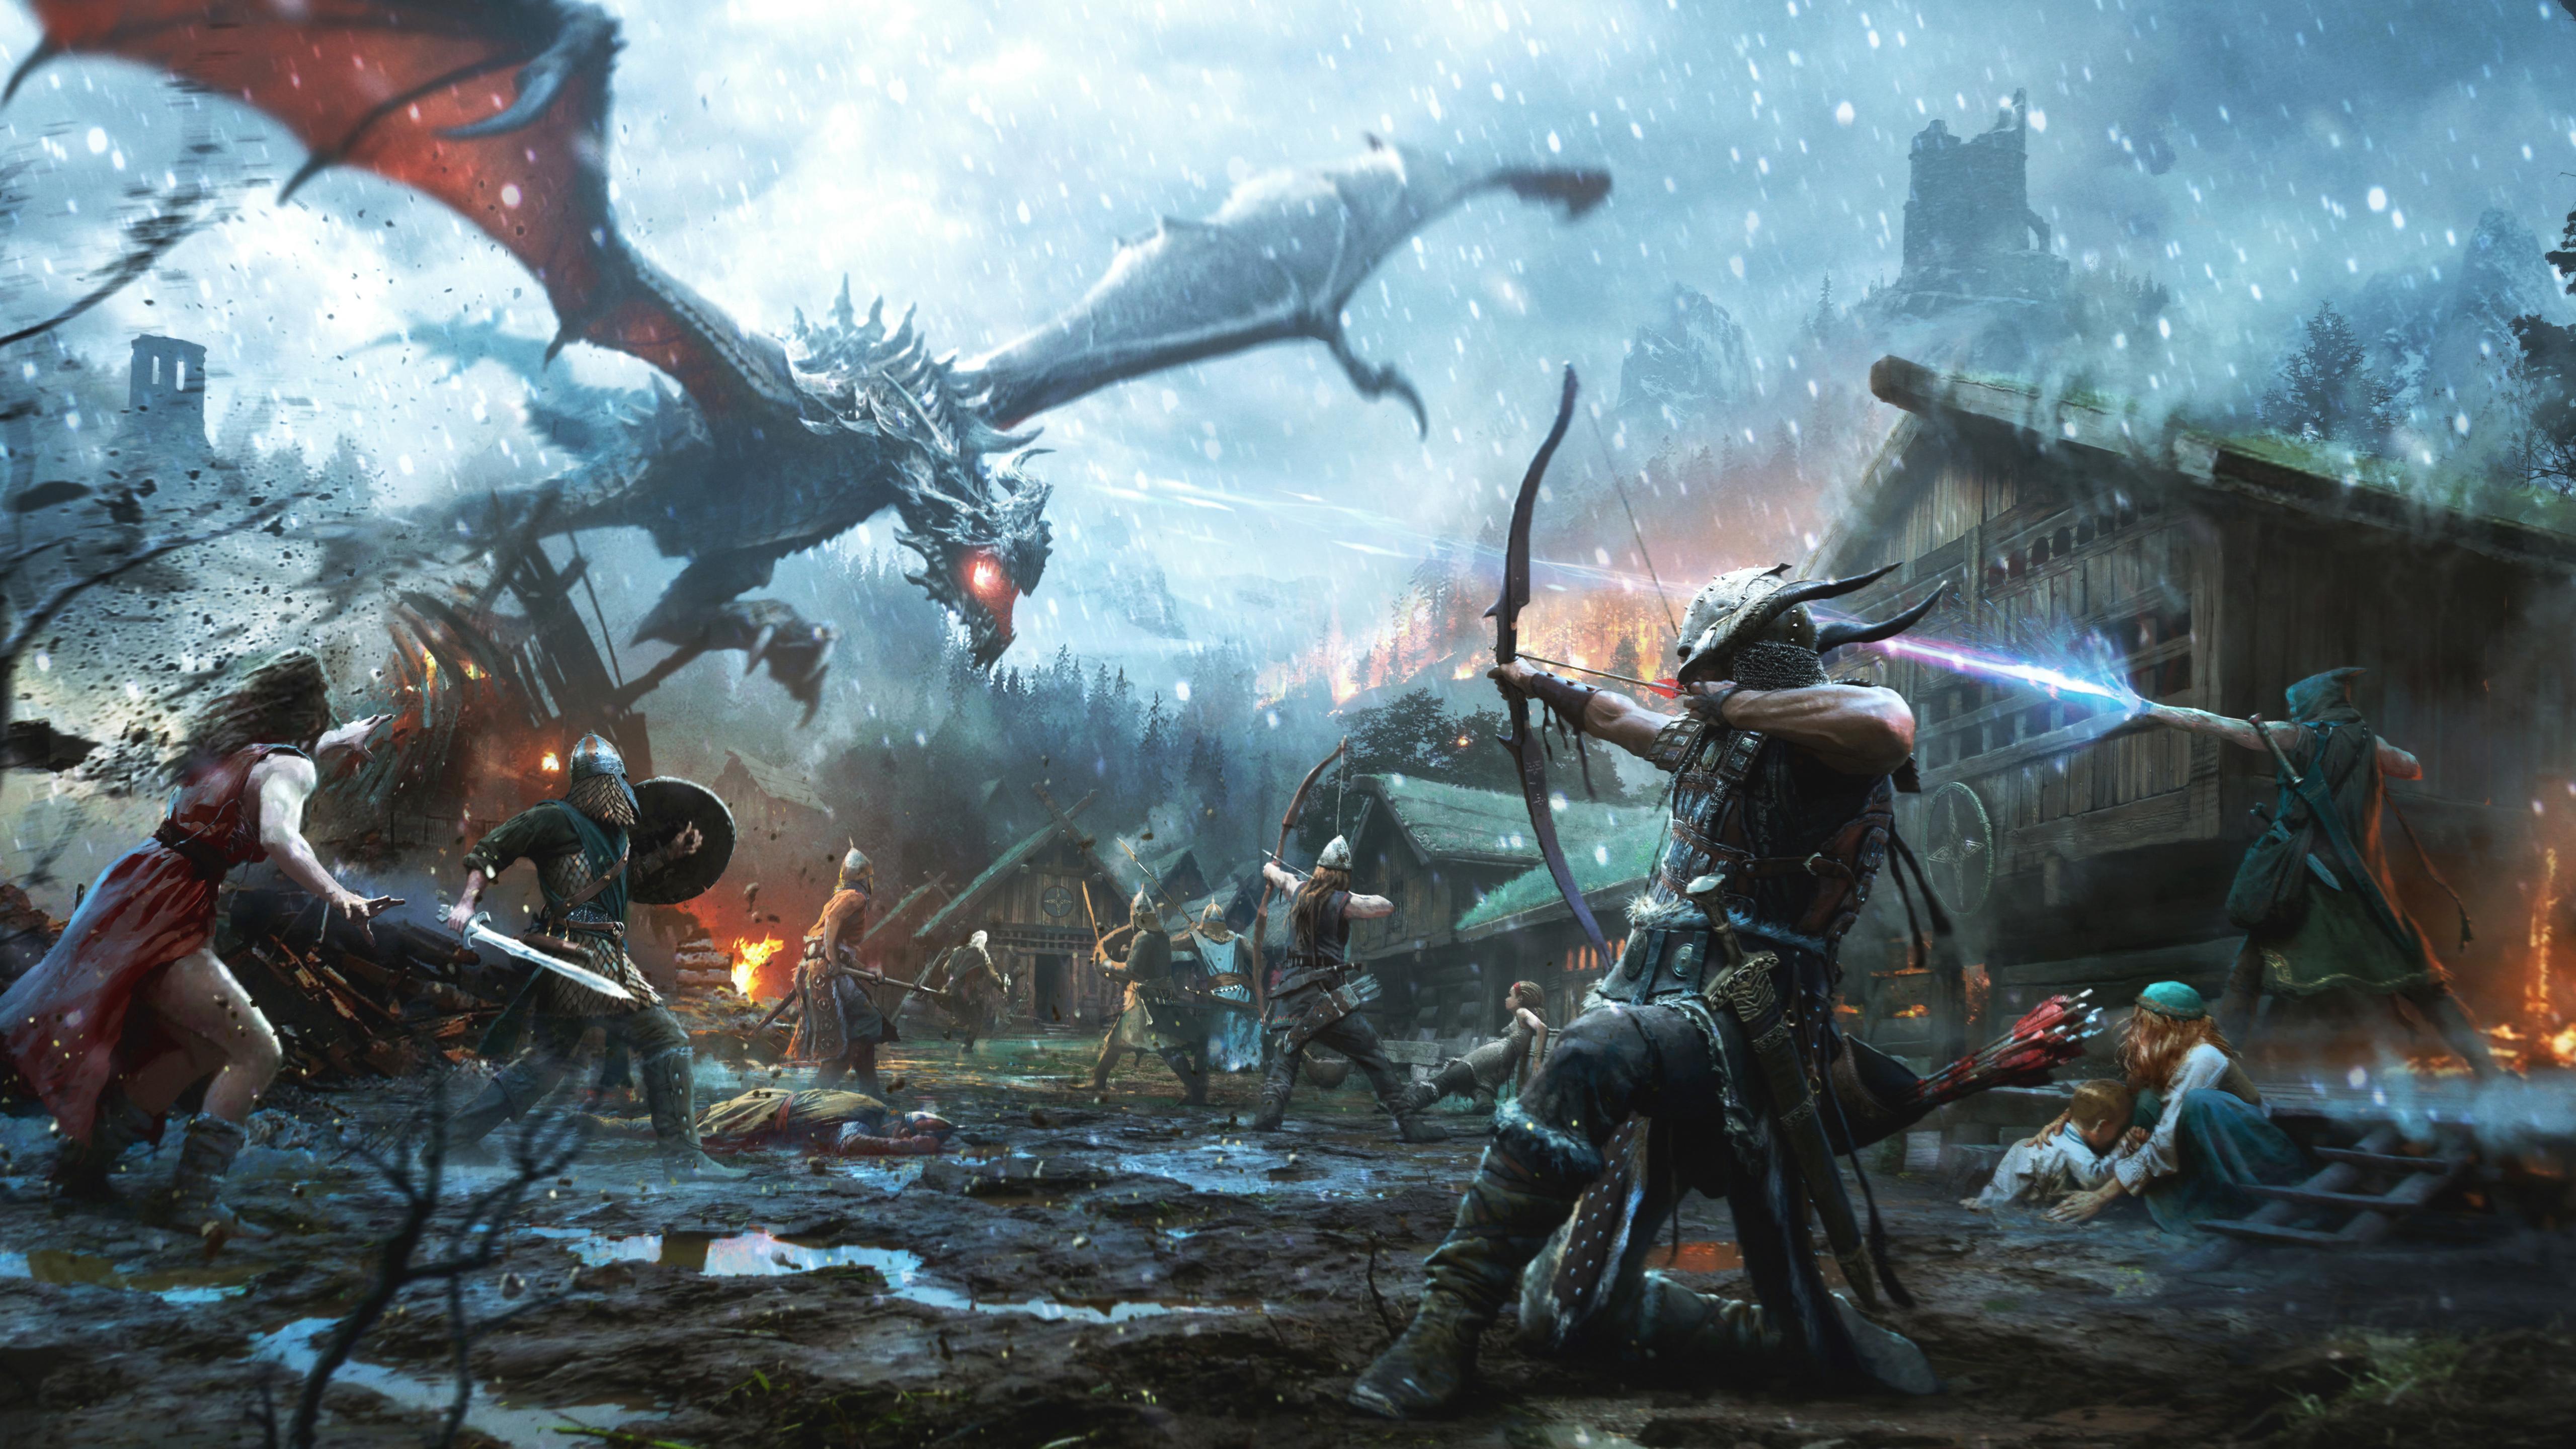 The Elder Scrolls Video Game 4k, HD Games, 4k Wallpapers ...